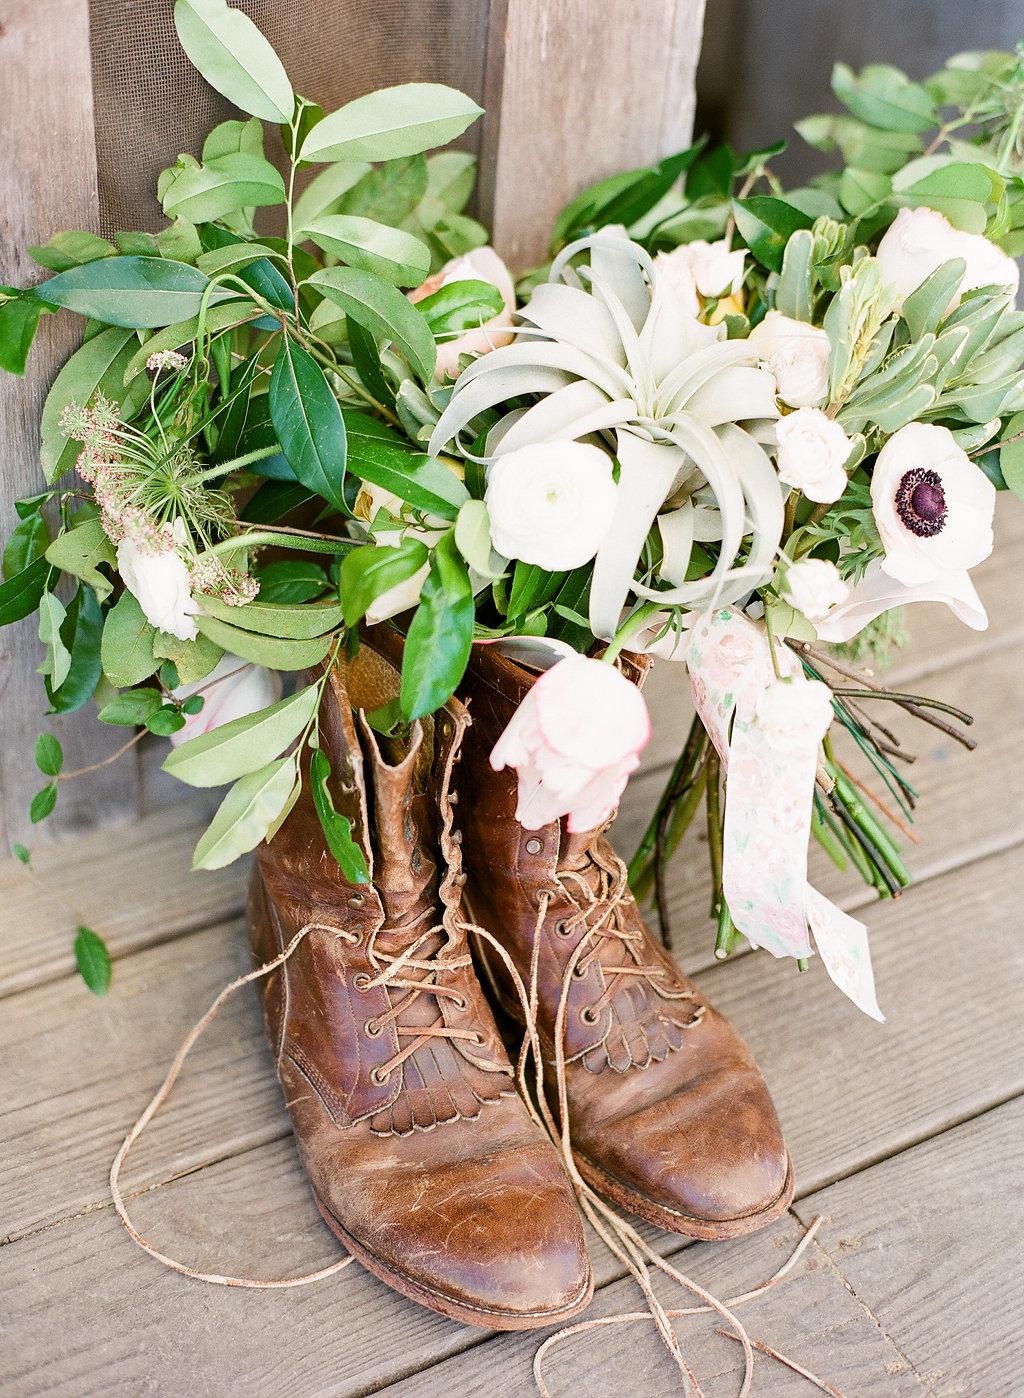 the-wyld-savannah-wedding-venue-ivory-and-beau-savannah-wedding-planner-savannah-event-designer-savannah-wedding-florist-bridal-bouquet-with-airplants-rustic-outdoor-dock-bar-wedding.jpg